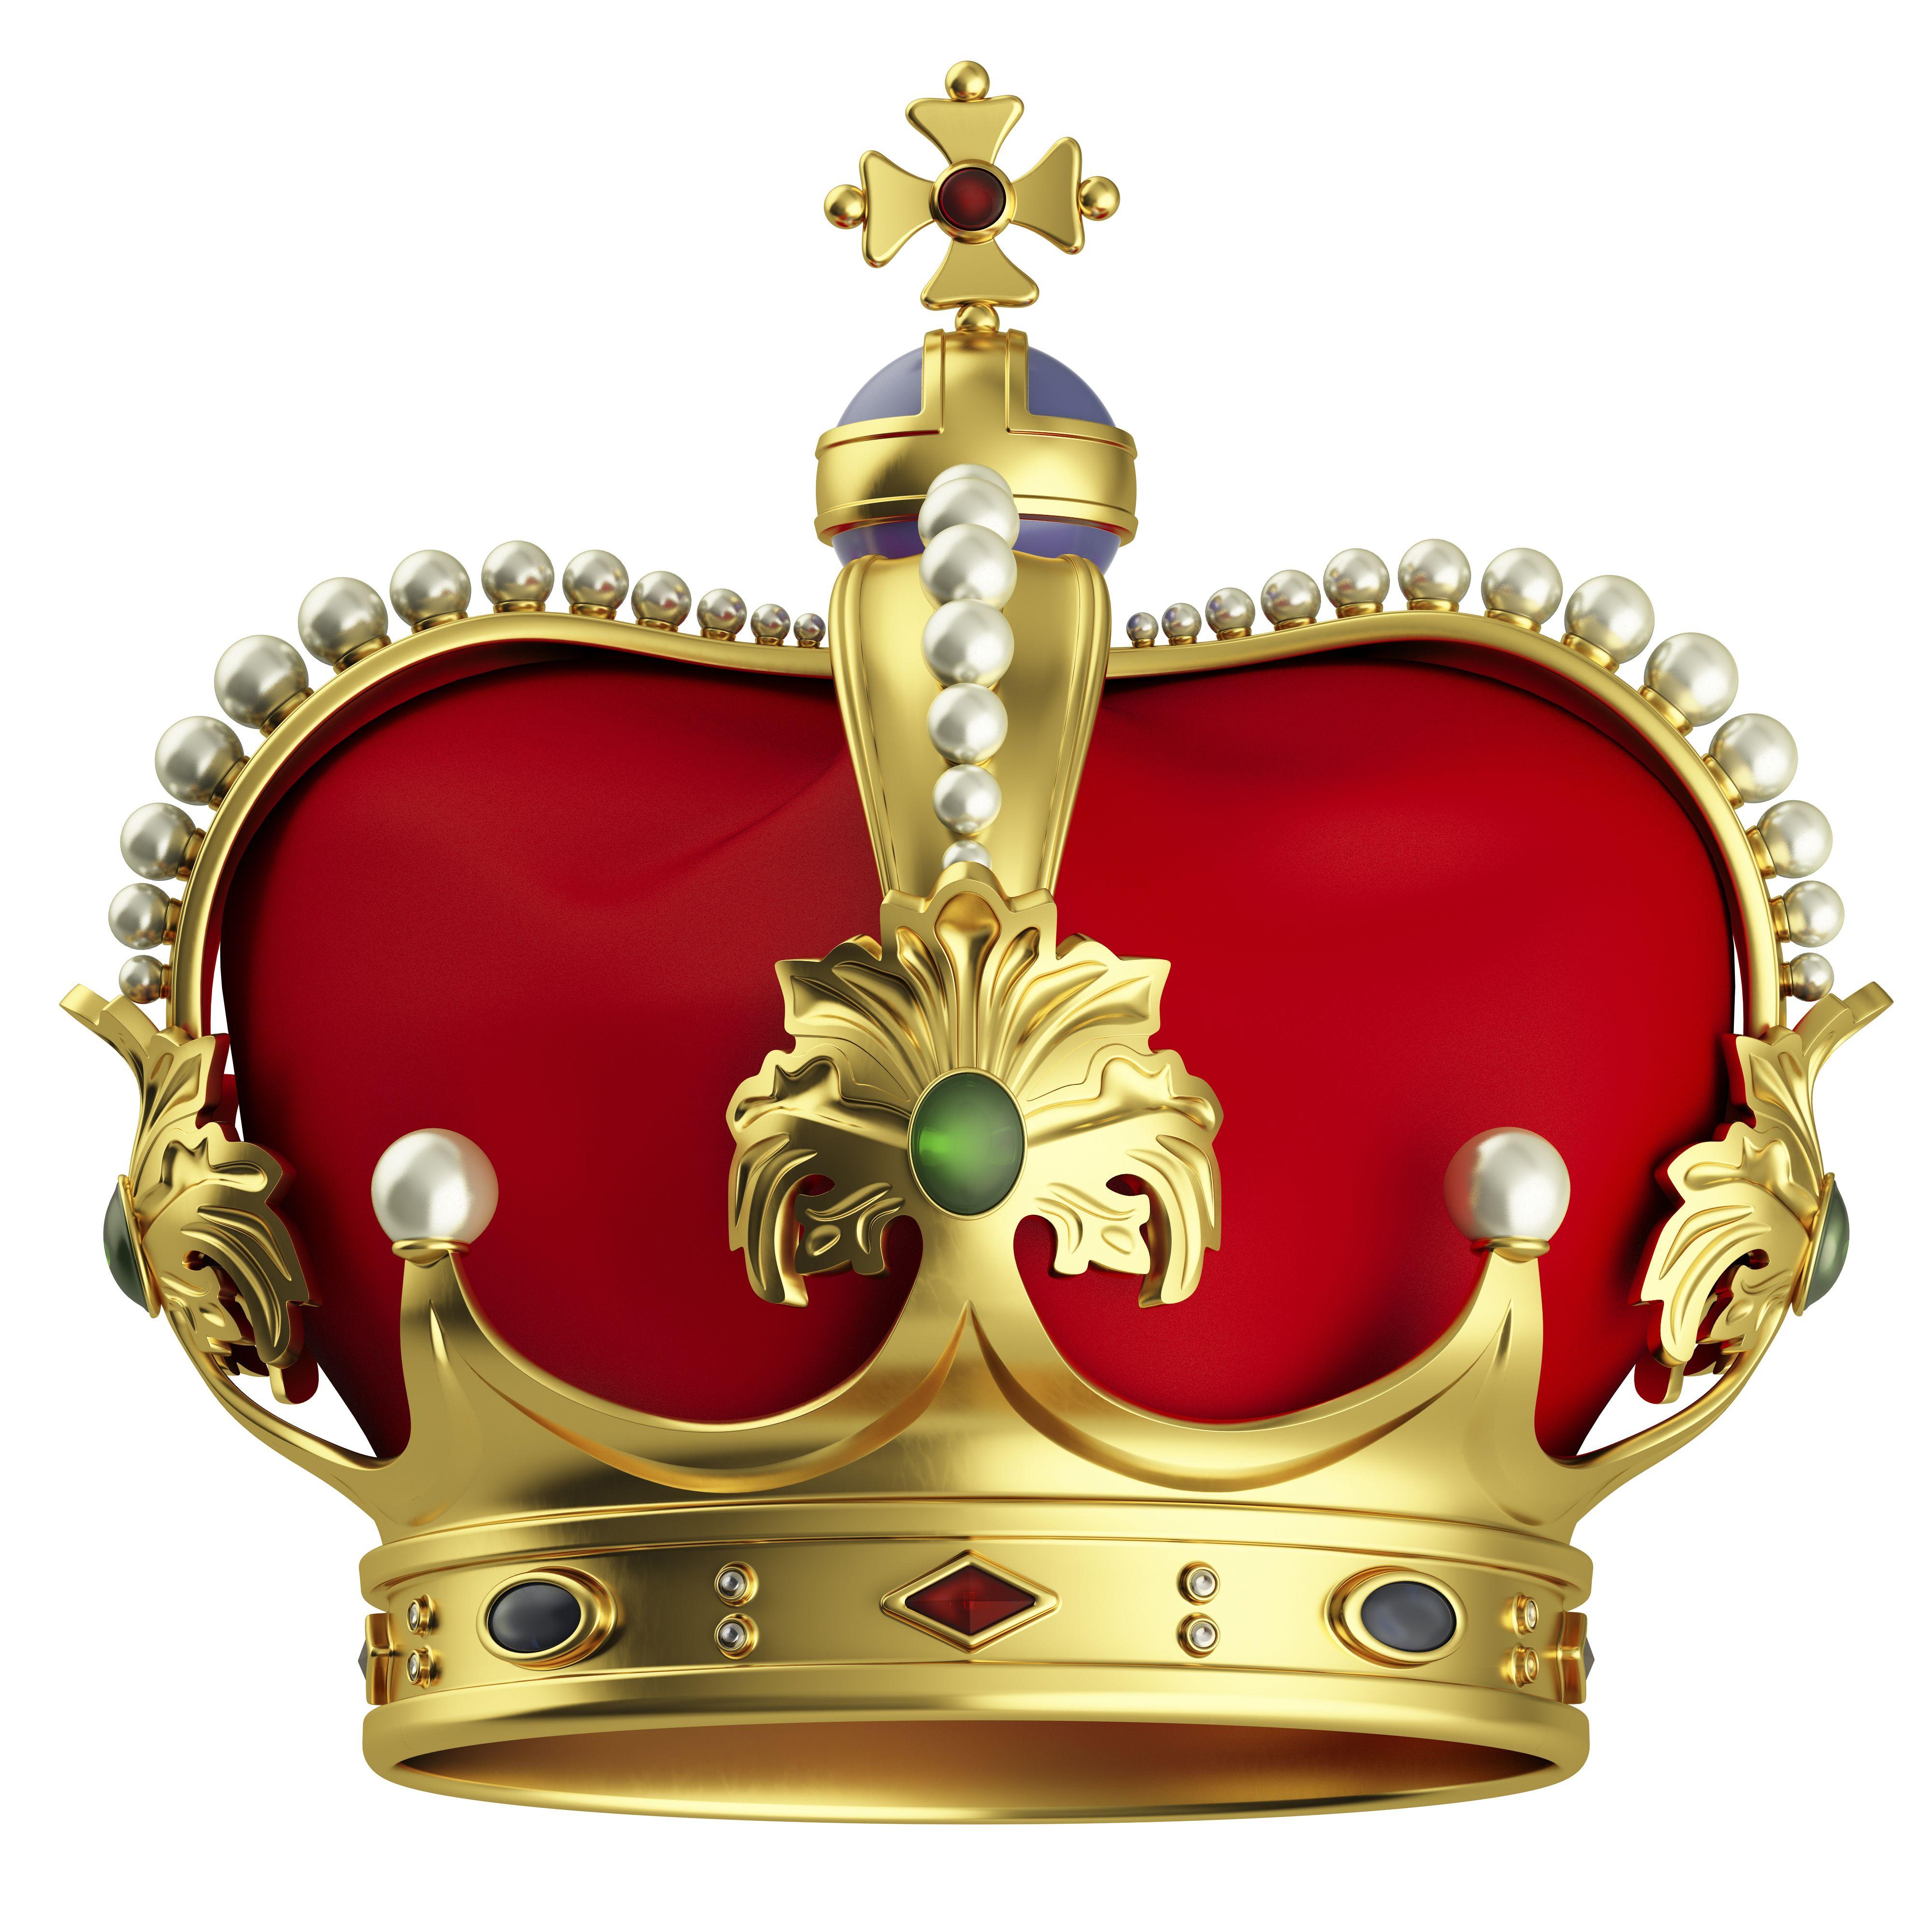 микрозаймы онлайн золотая корона